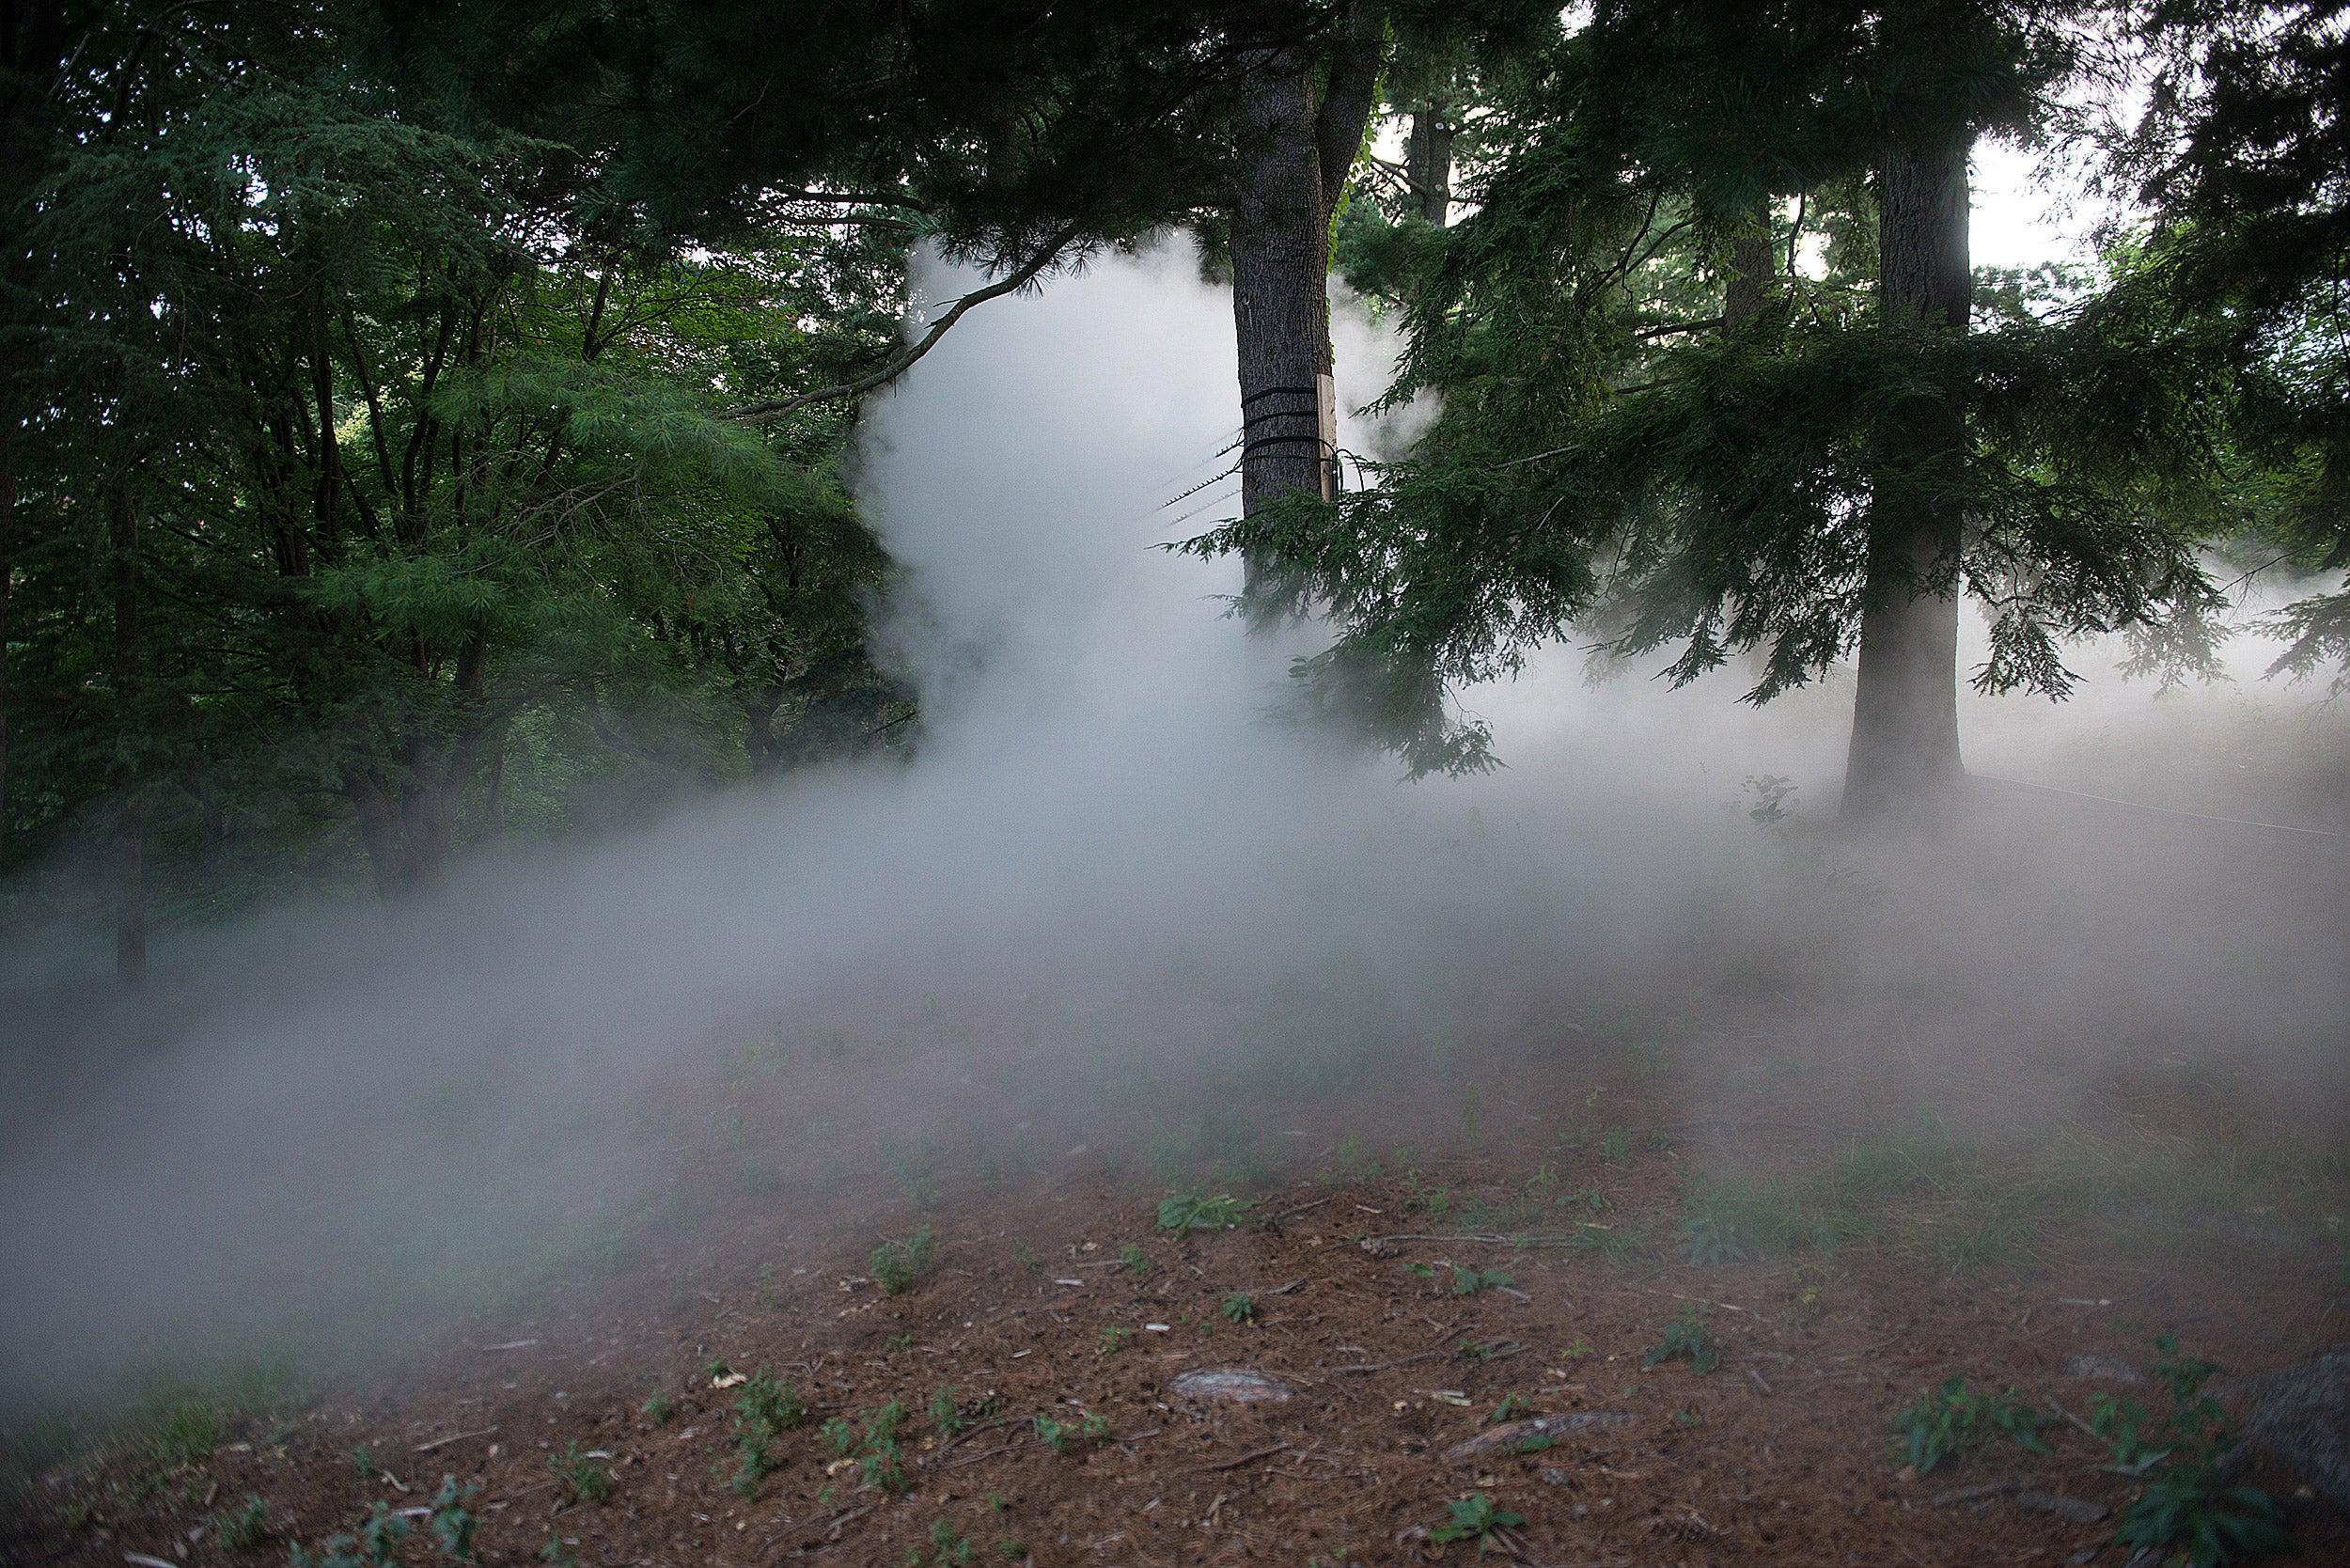 Fujiko Nakaya's Fog x Hill at the Arnold Arboretum.